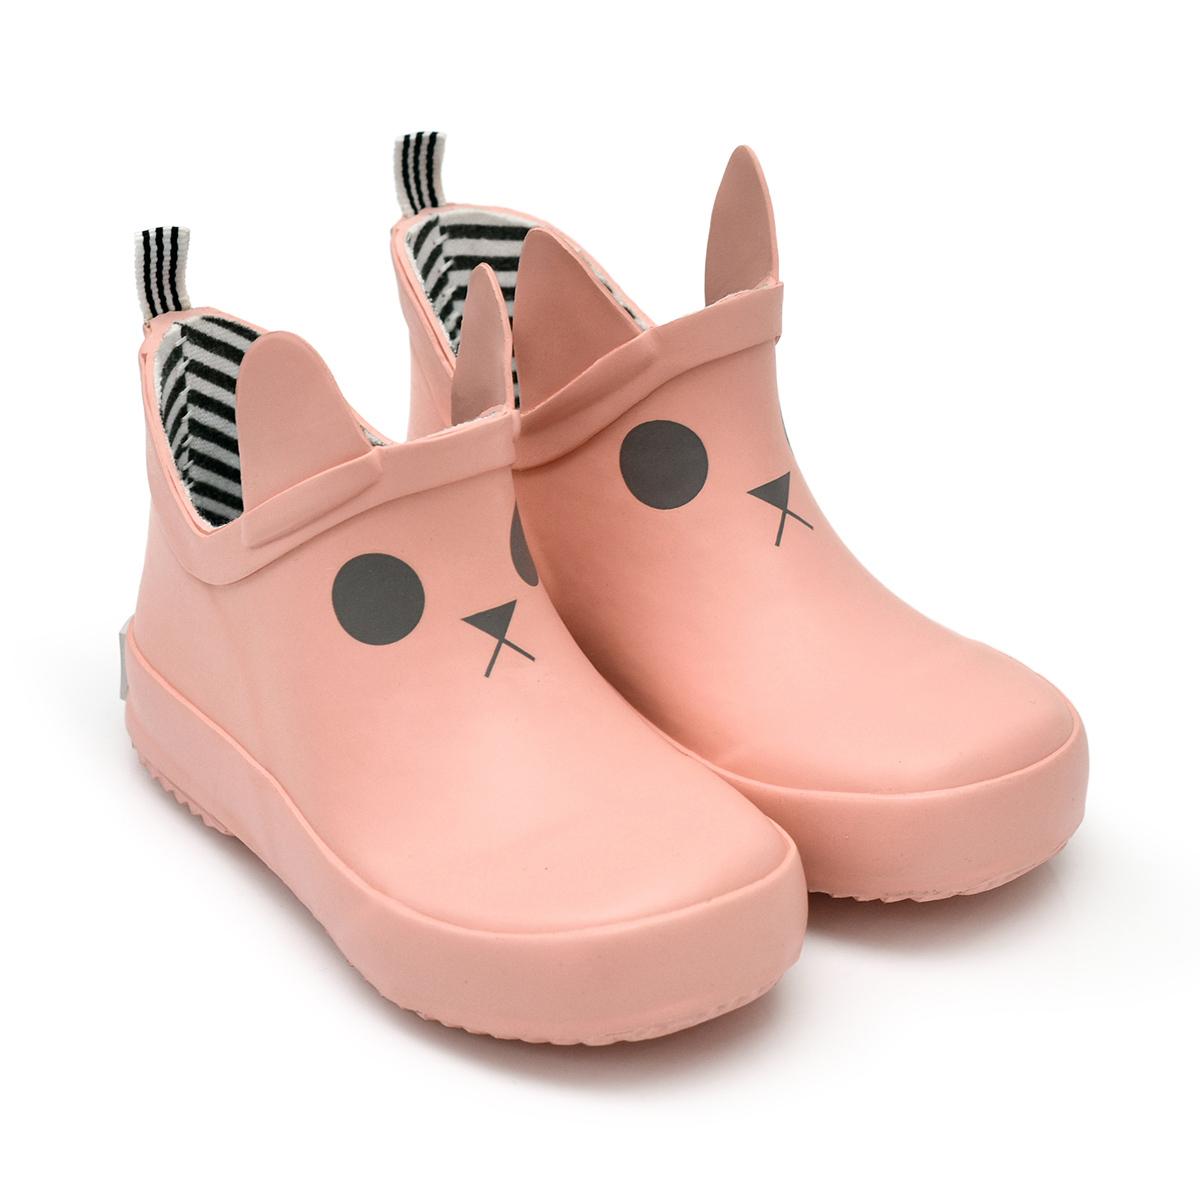 Chaussons & Chaussures Bottines Kerran Salmon Pink - 23 Bottines Kerran Salmon Pink - 23